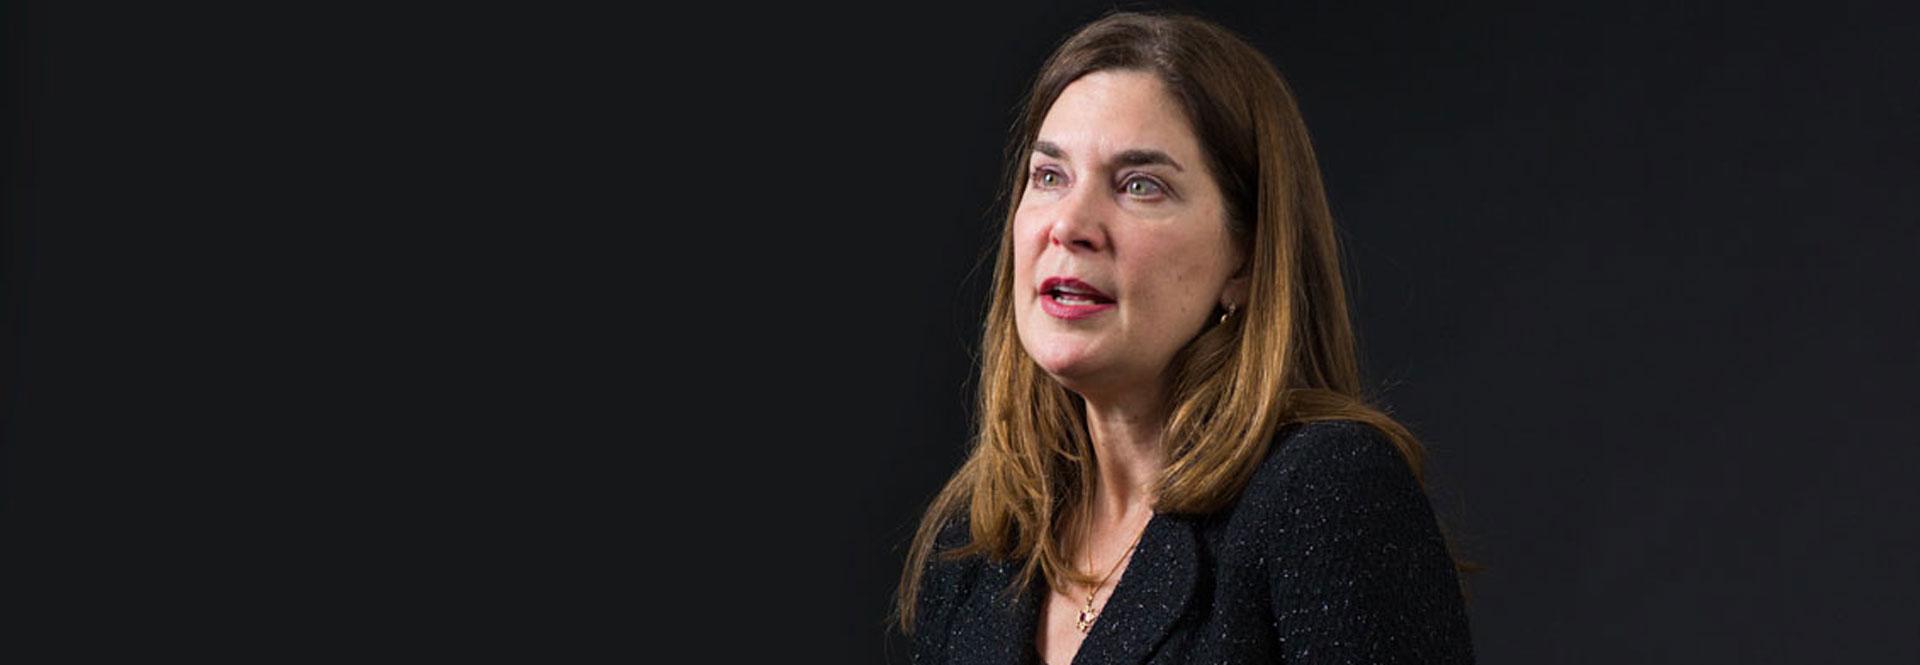 Ana Marie Argilagos, President of Hispanics in Philanthropy. Photo: Samantha Laub / AL DÍA News